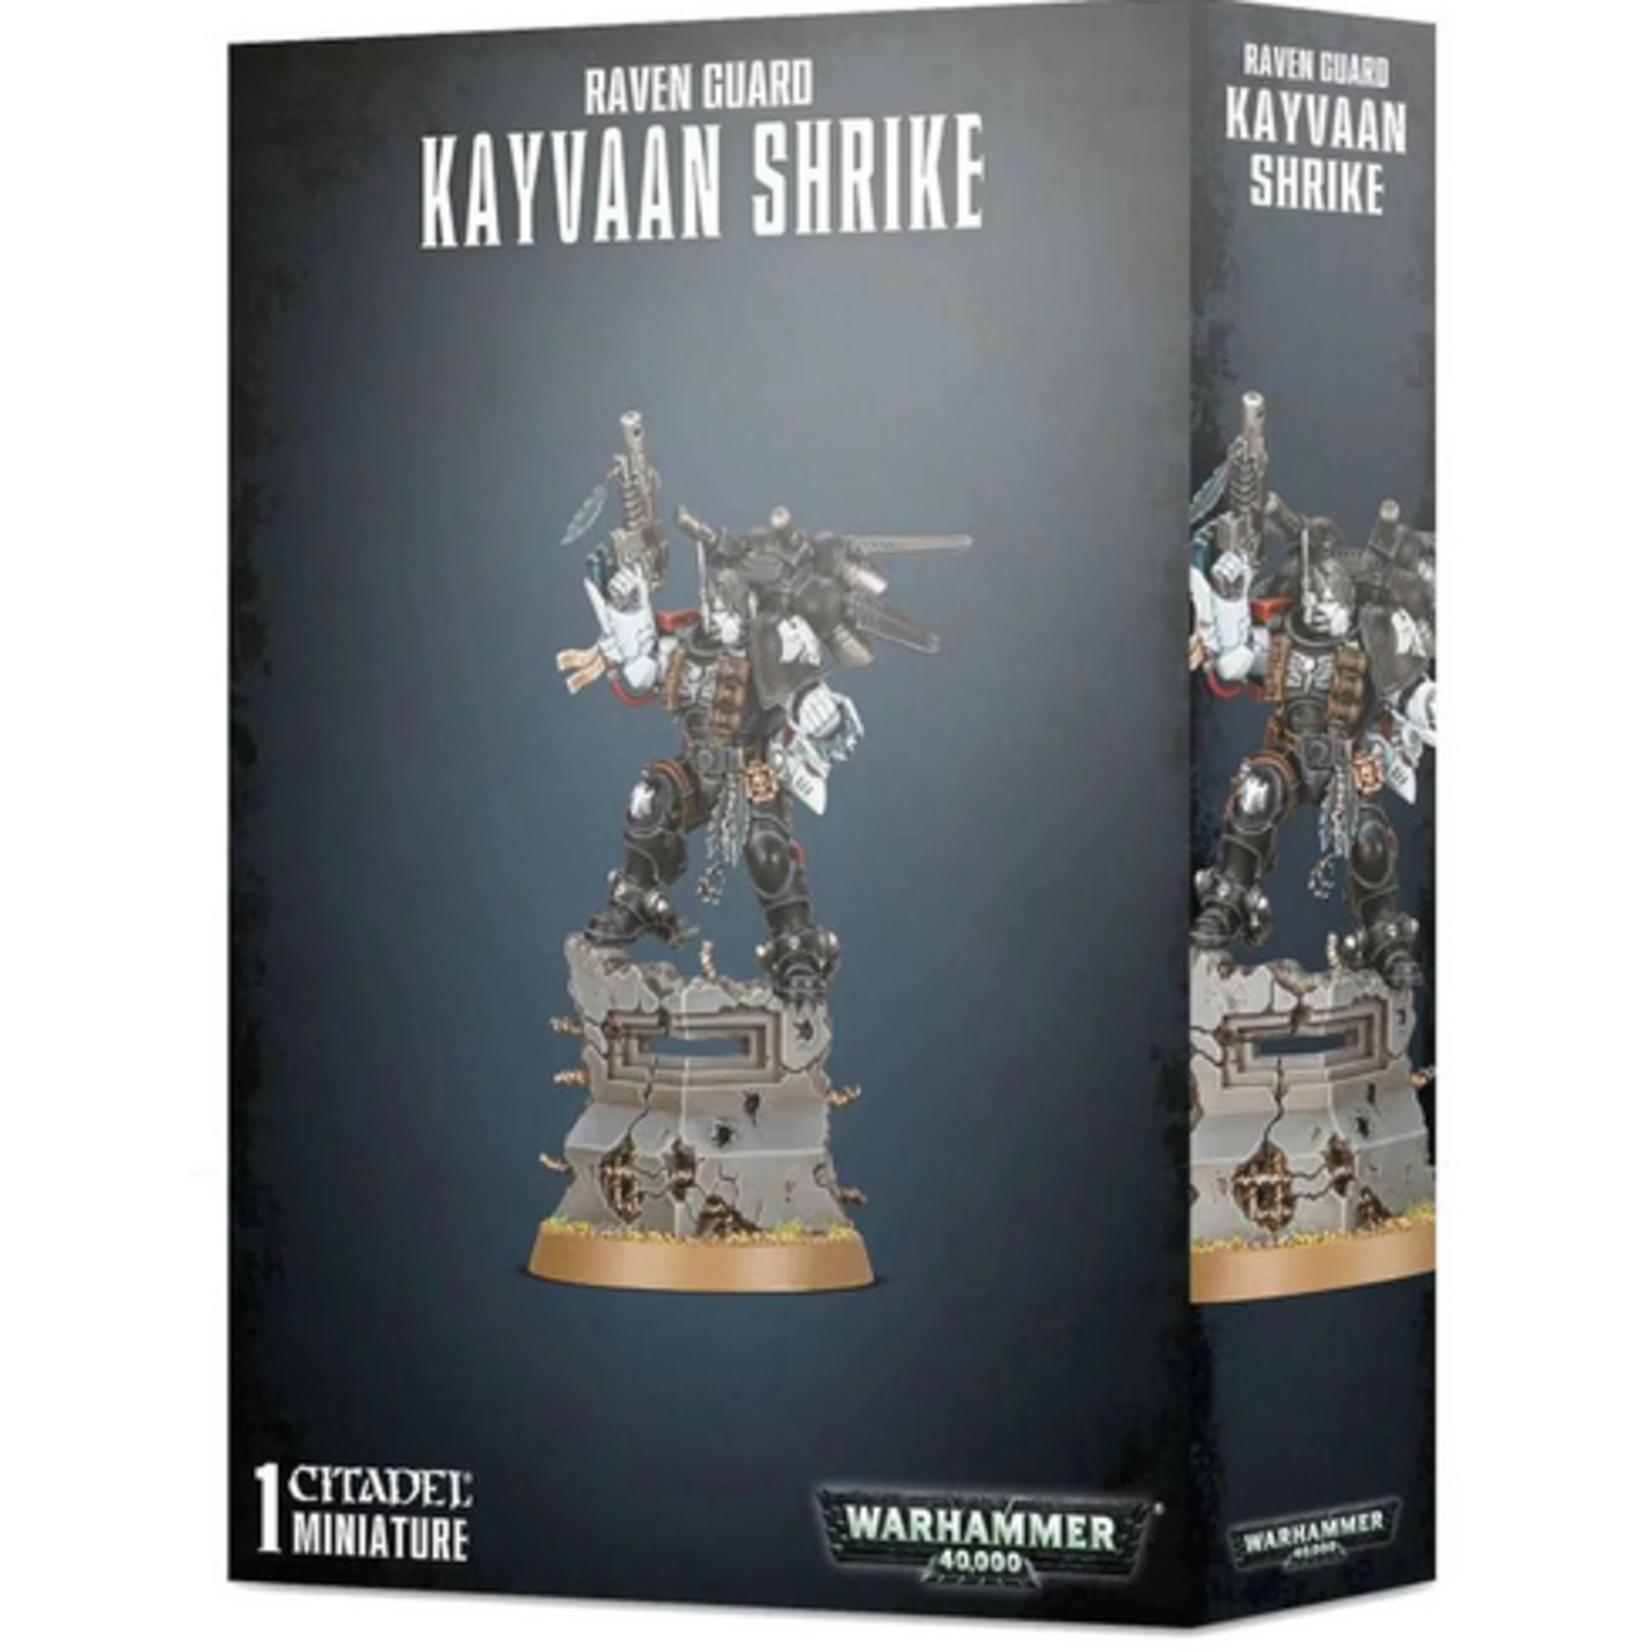 Raven Guard Kayvaan Shrike (40K)